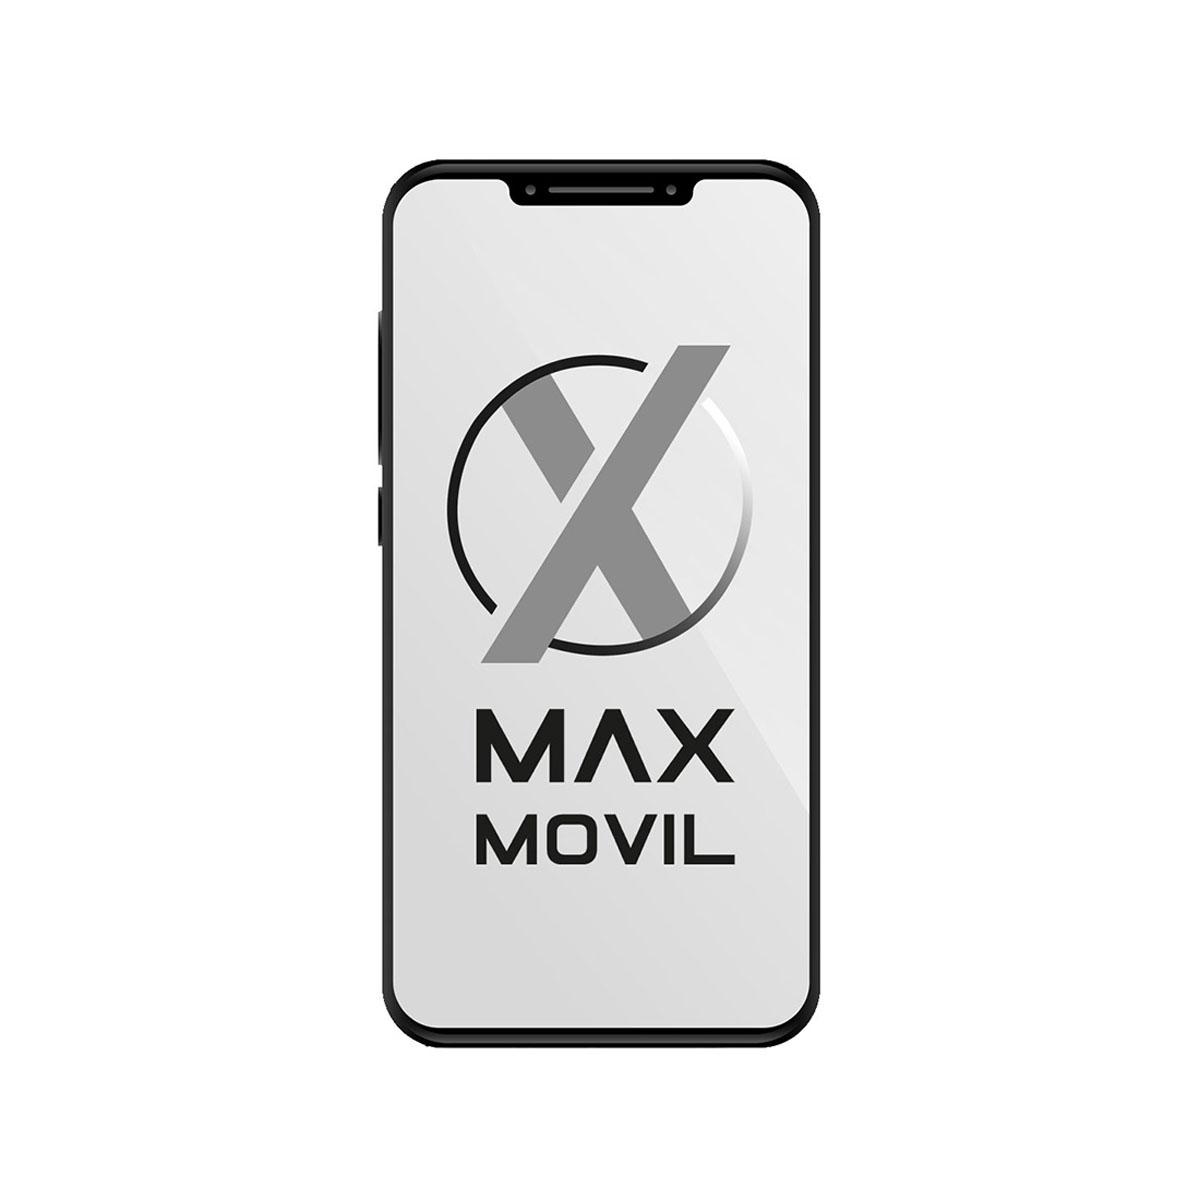 Telefono movil Iphone 6S 64GB space grey CPO ECORECICLADO GRADE A